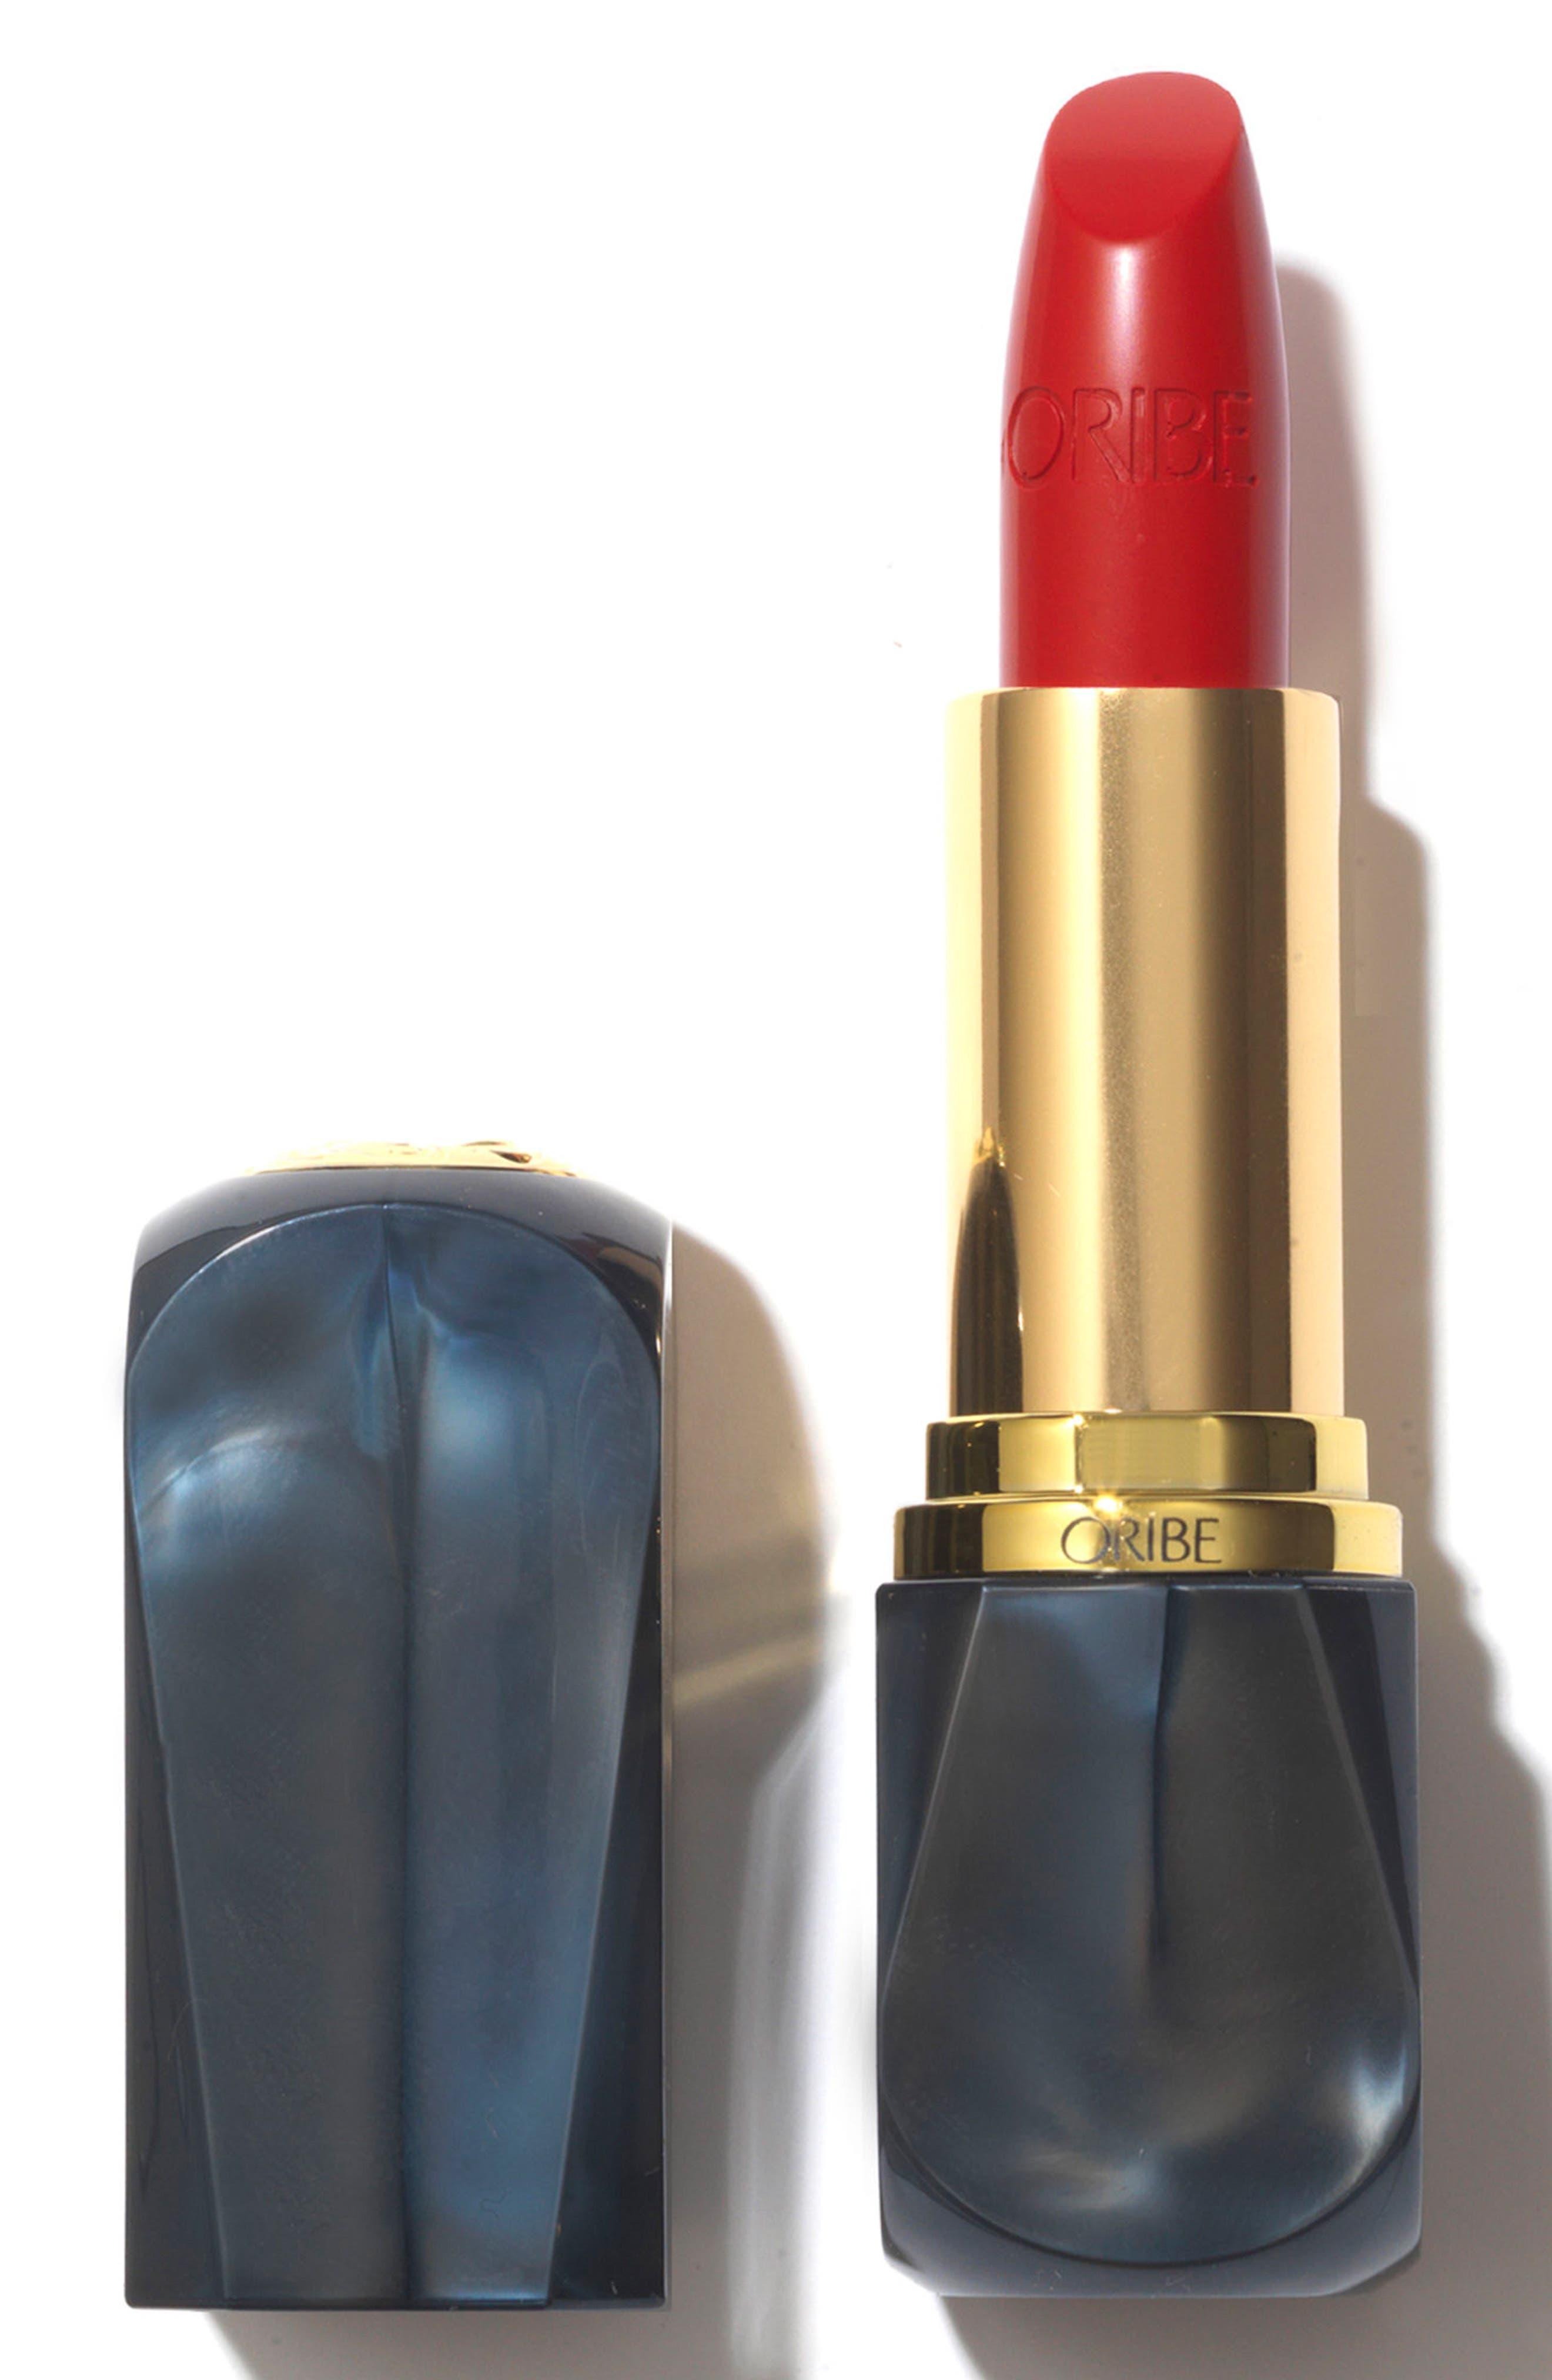 SPACE.NK.apothecary Oribe Lip Lust Crème Lipstick